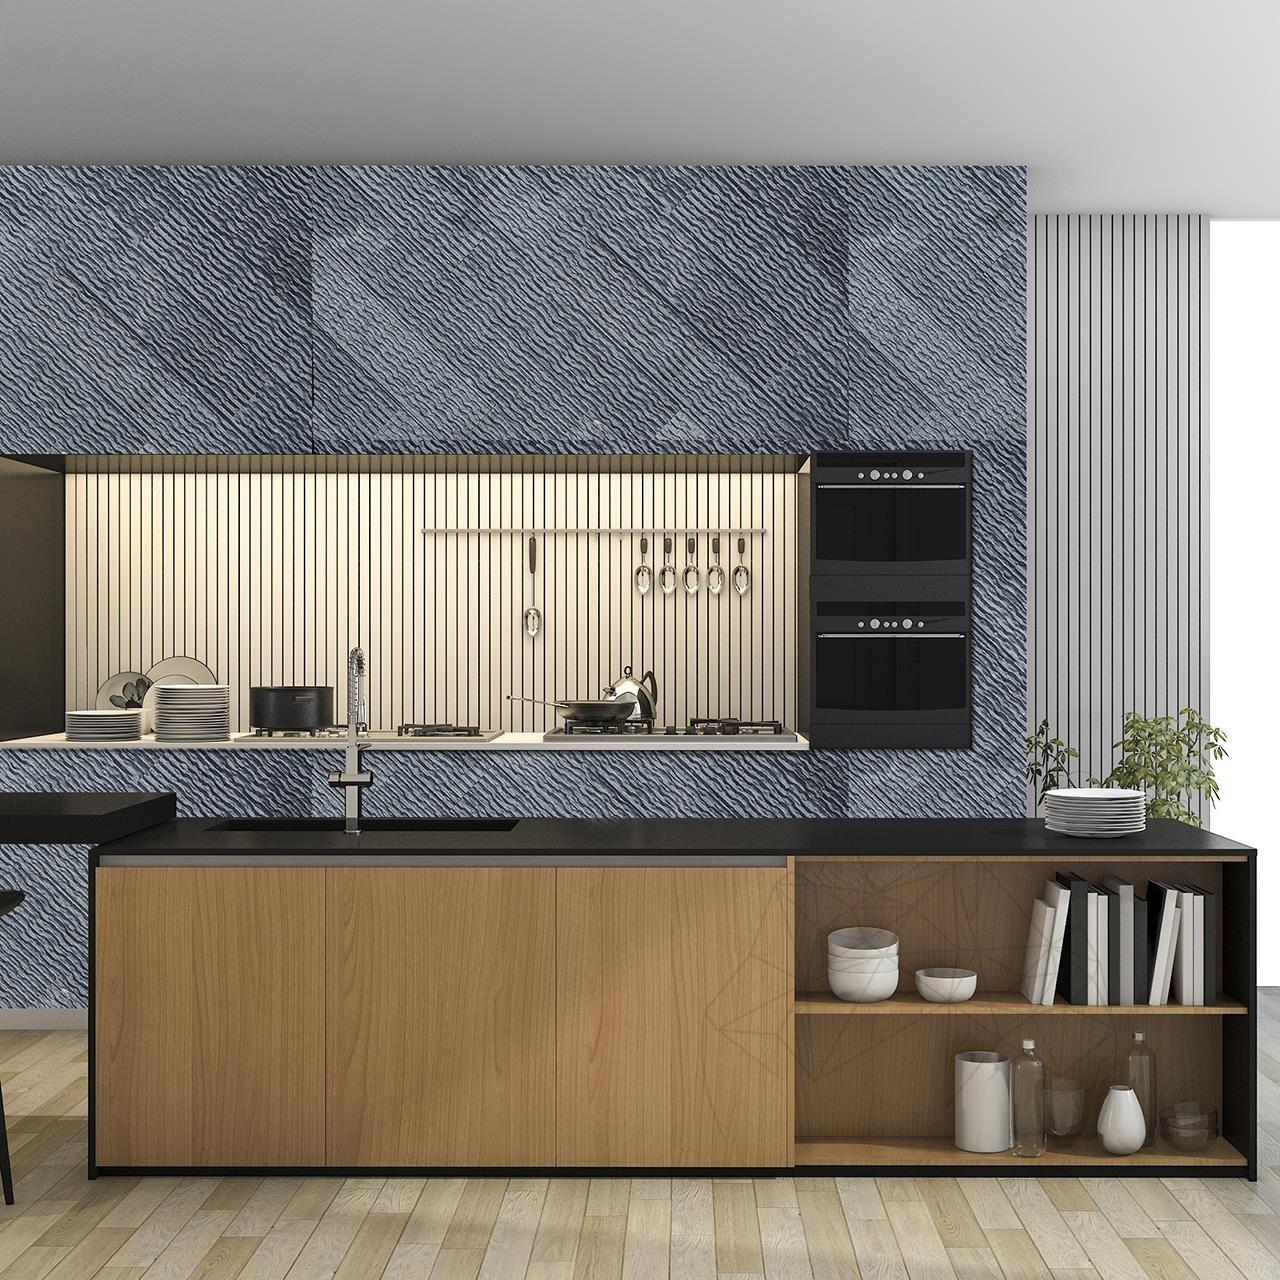 Natural Stone Panels Iris Marble Wall Cladding Panel 15 X 60 Cm Piatraonline Com